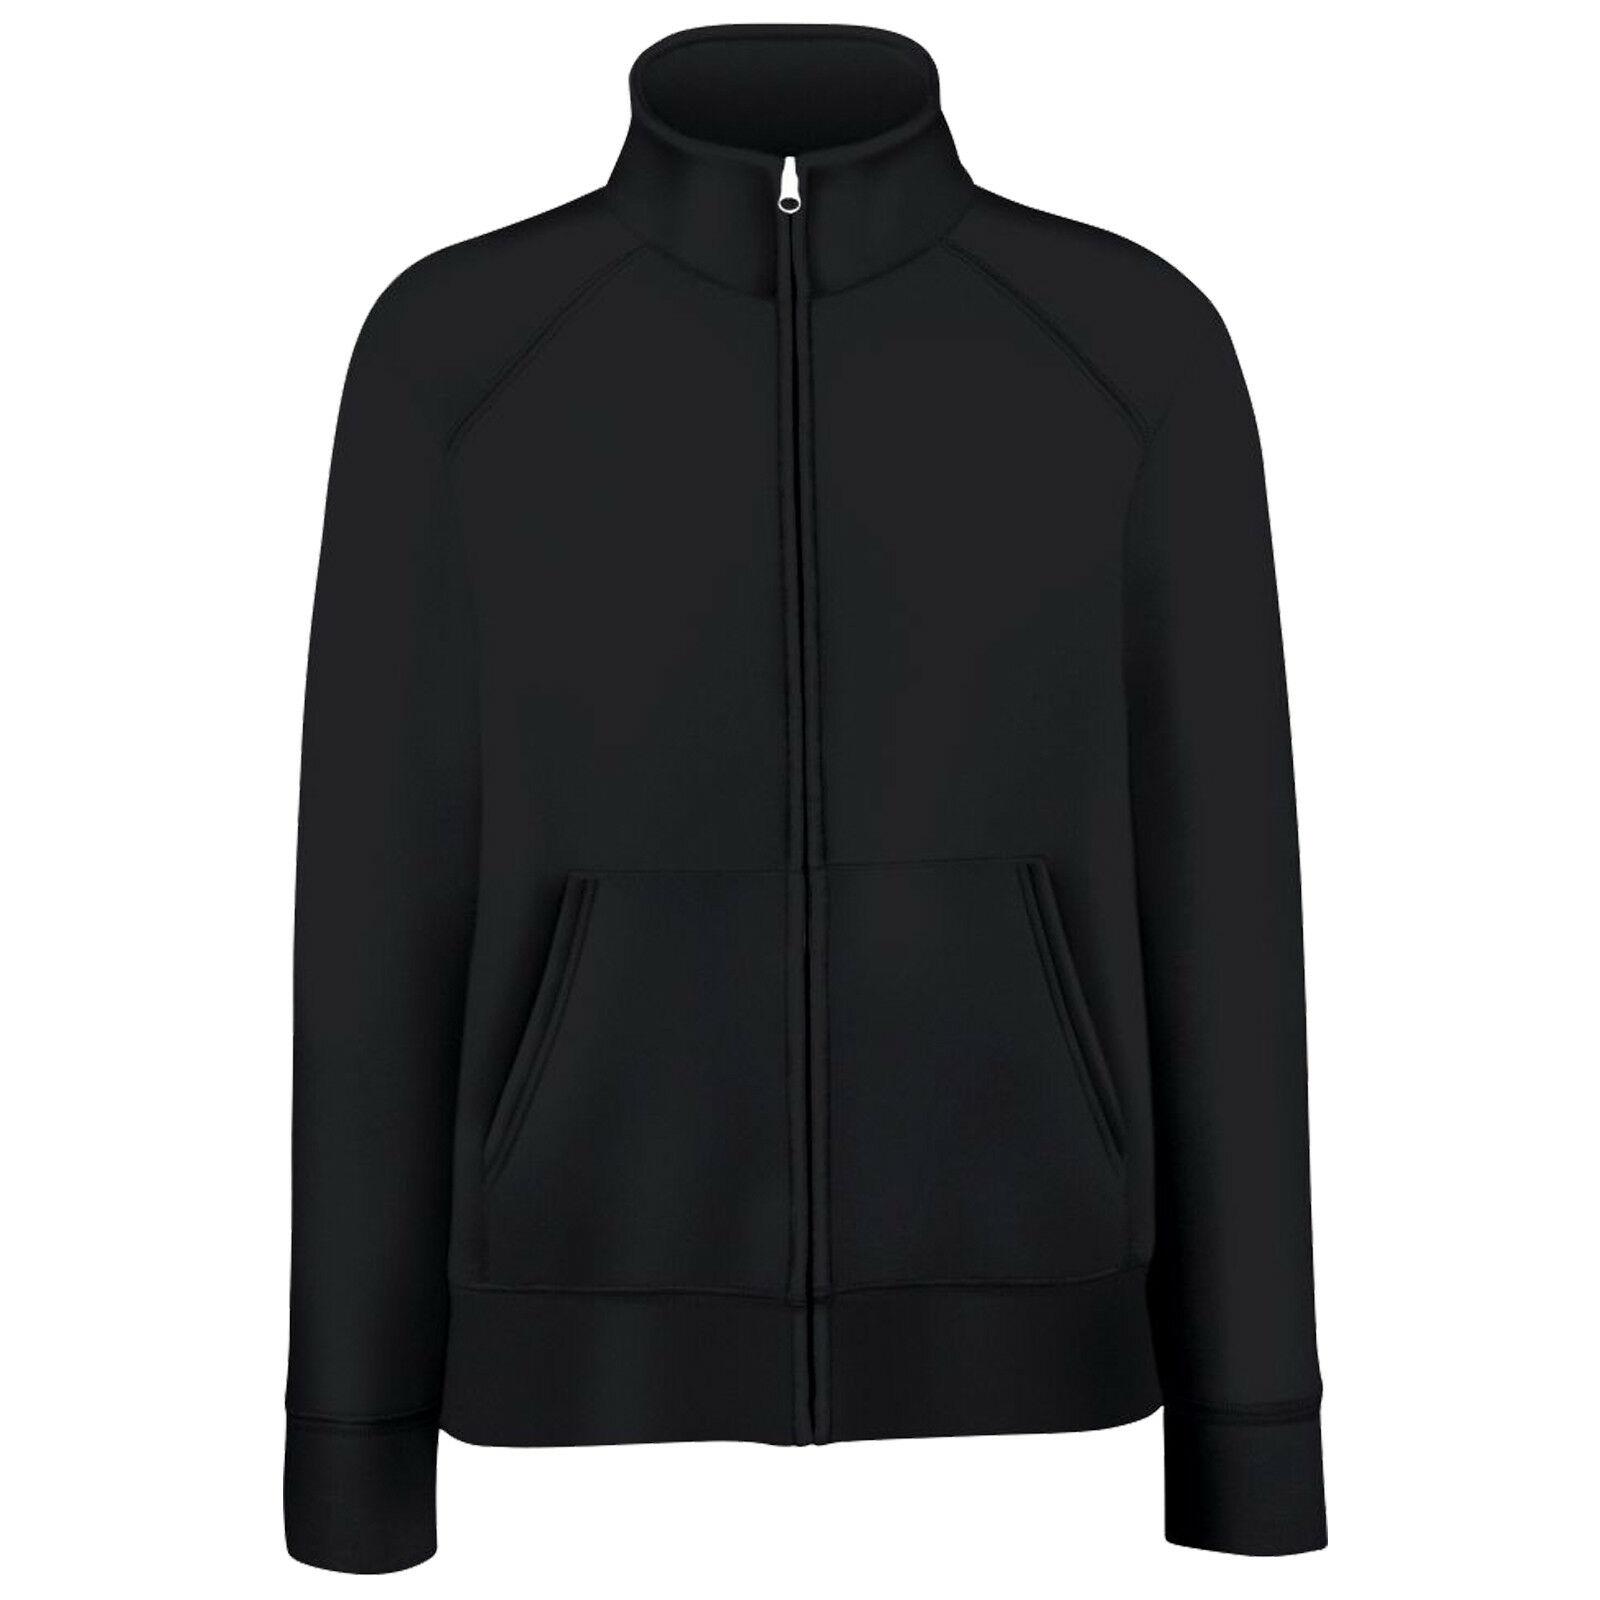 Fruit Of The Loom Ladies/Womens Lady-Fit Fleece Sweatshirt Jacket (2XL) (Black)